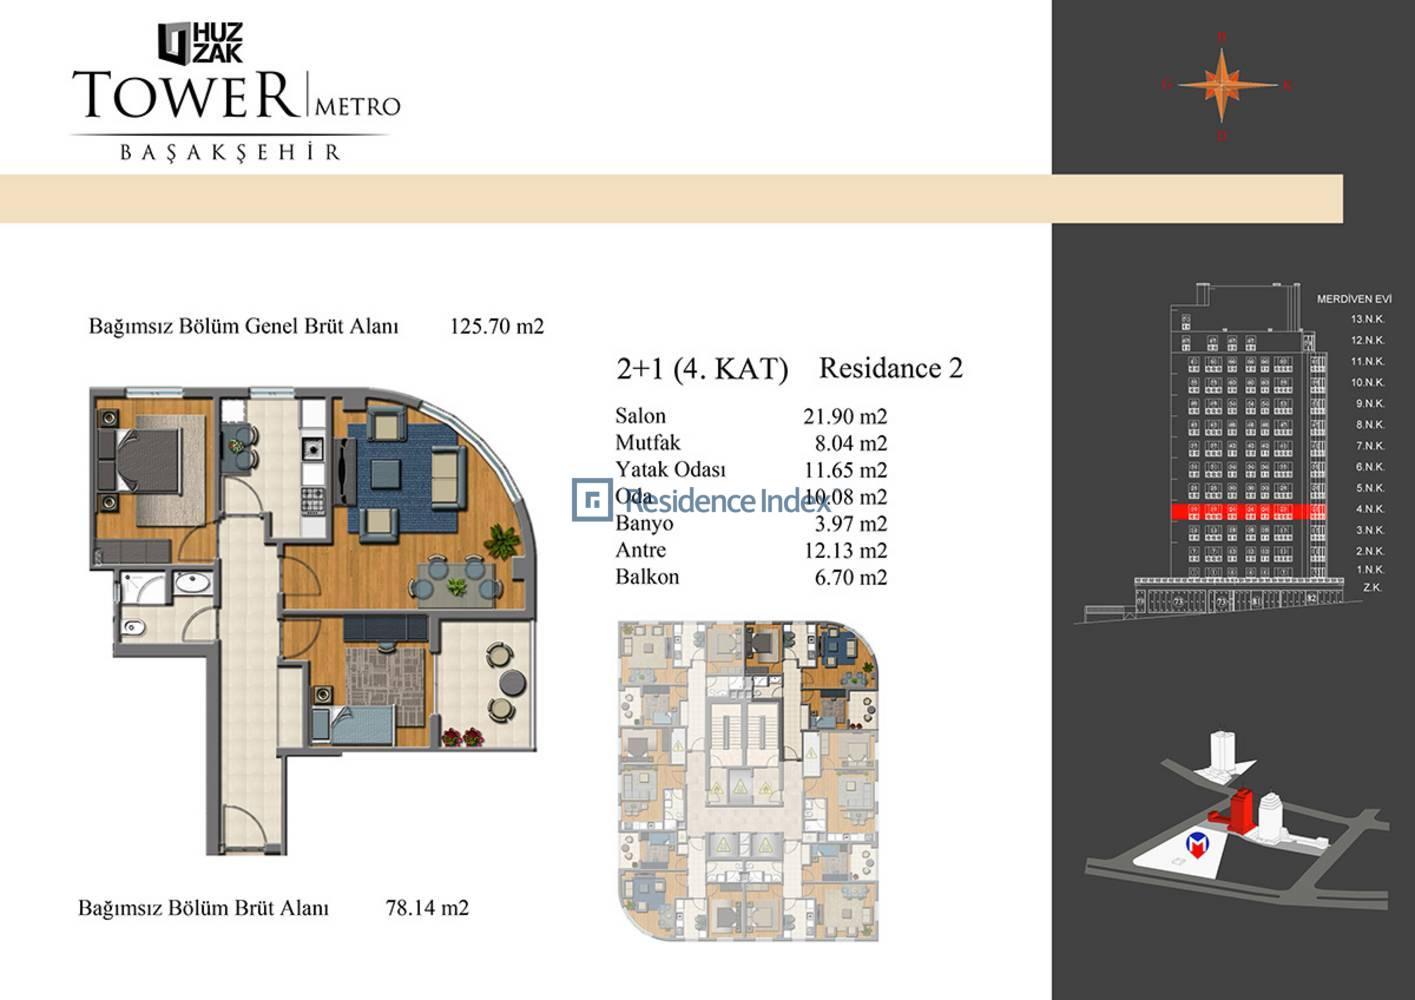 Huzzak Tower Metro Residence 2